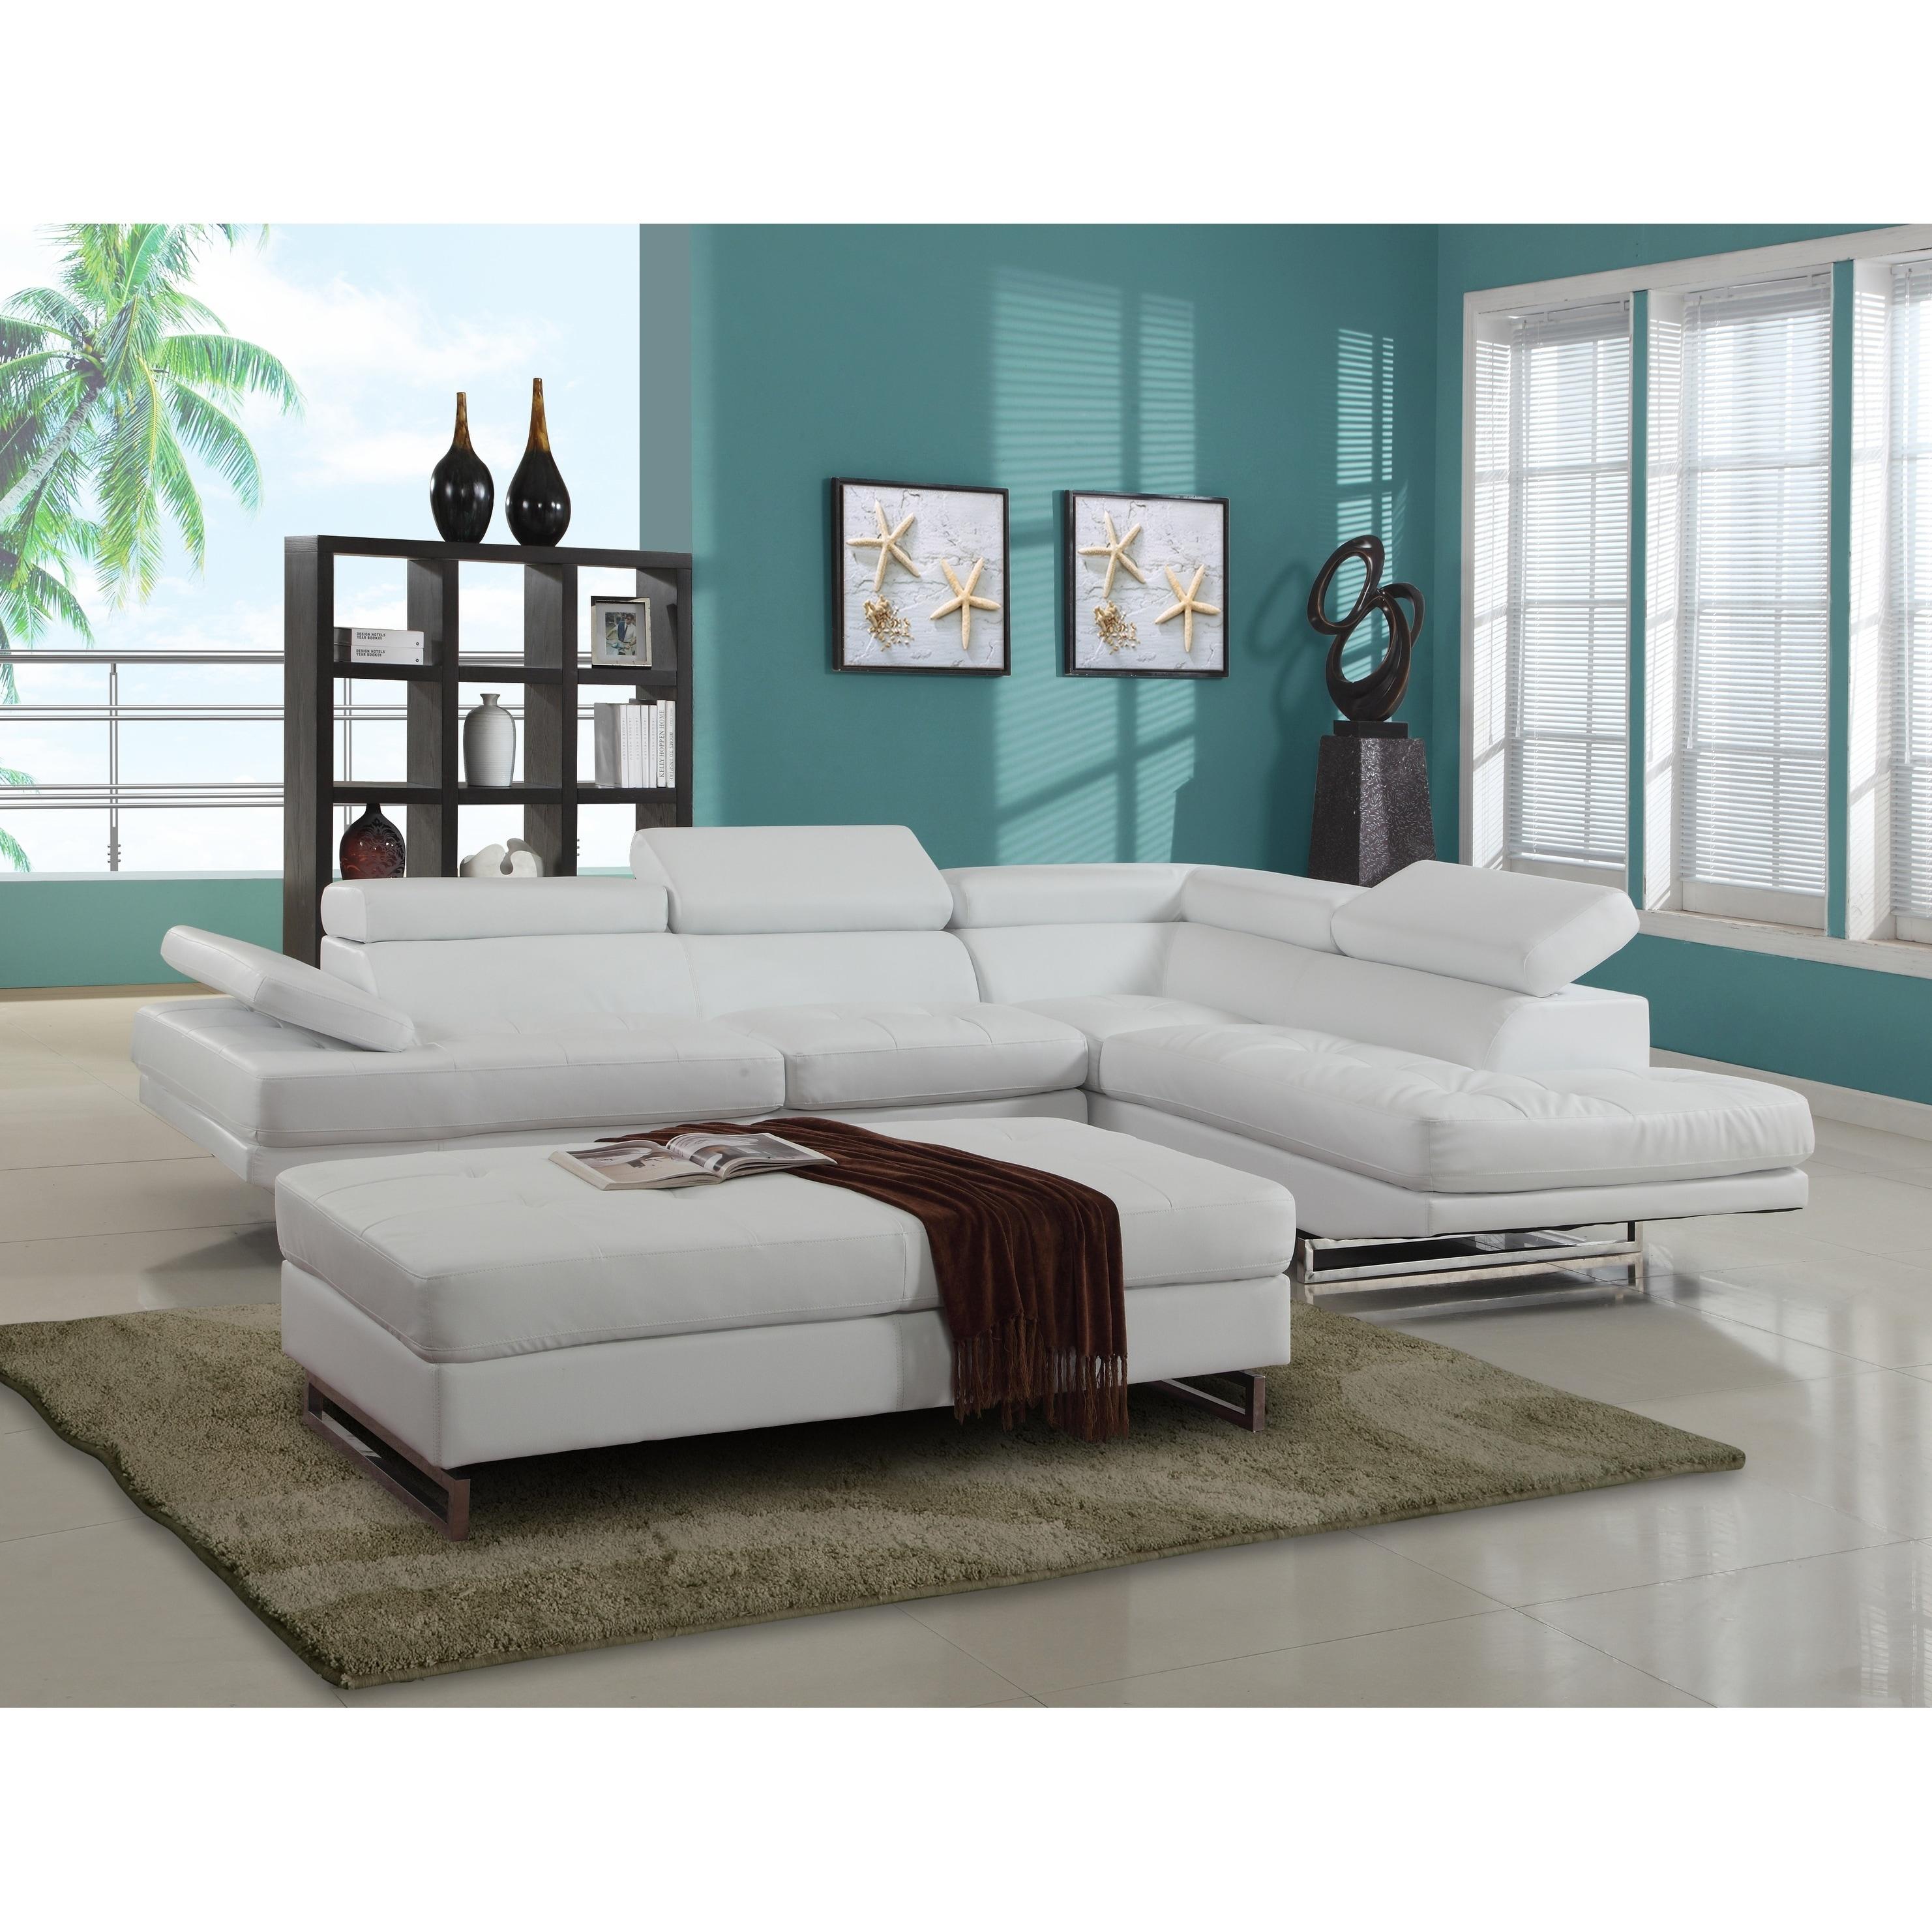 GU Furniture Oleander Faux Leather Upholstered Living Room Sectional